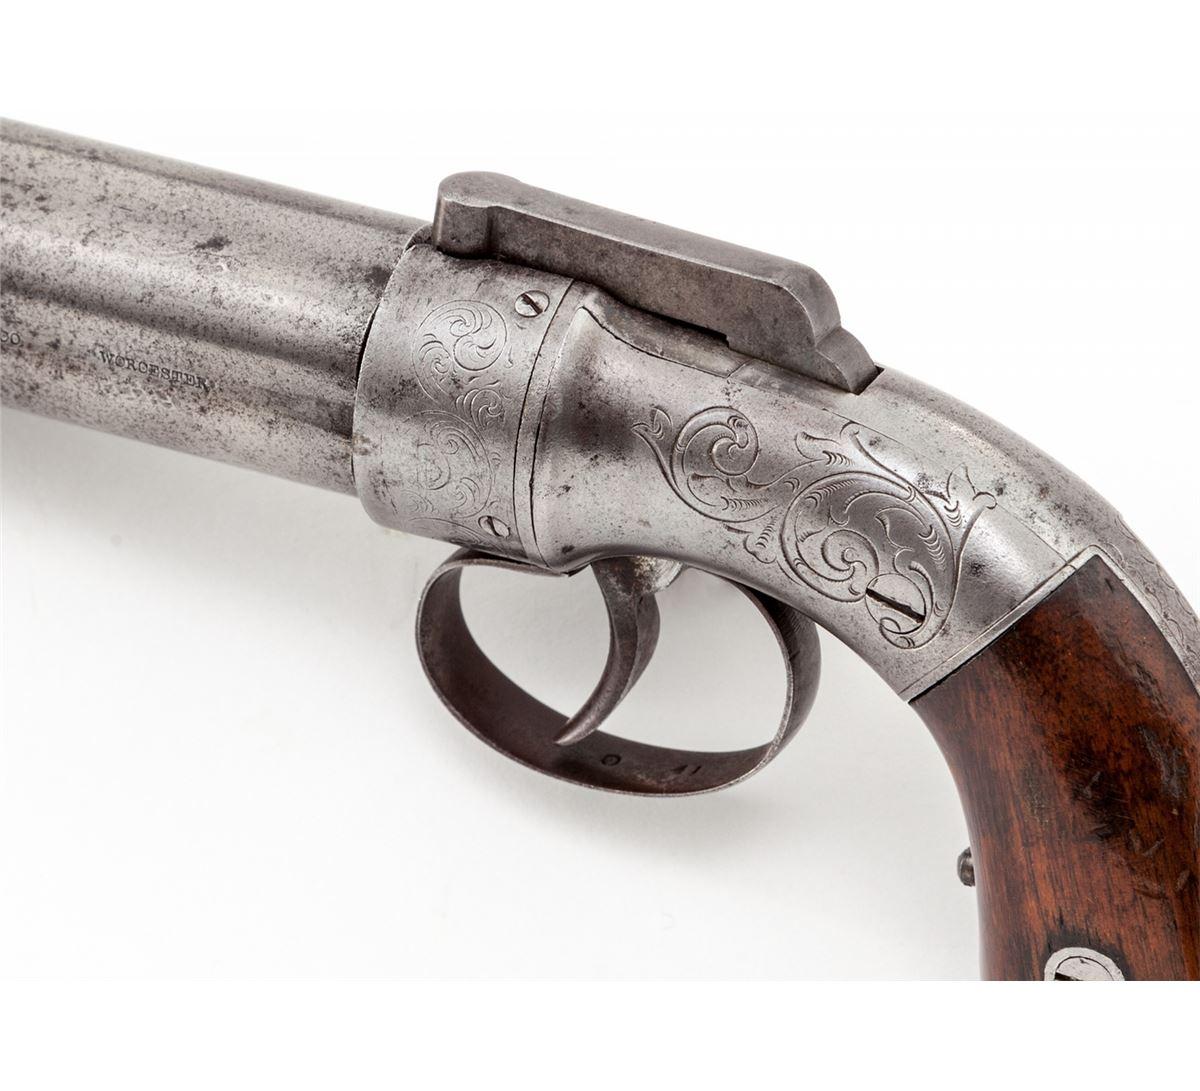 Images of Allen & Thurber Pepperbox Pistol | 1200x1091